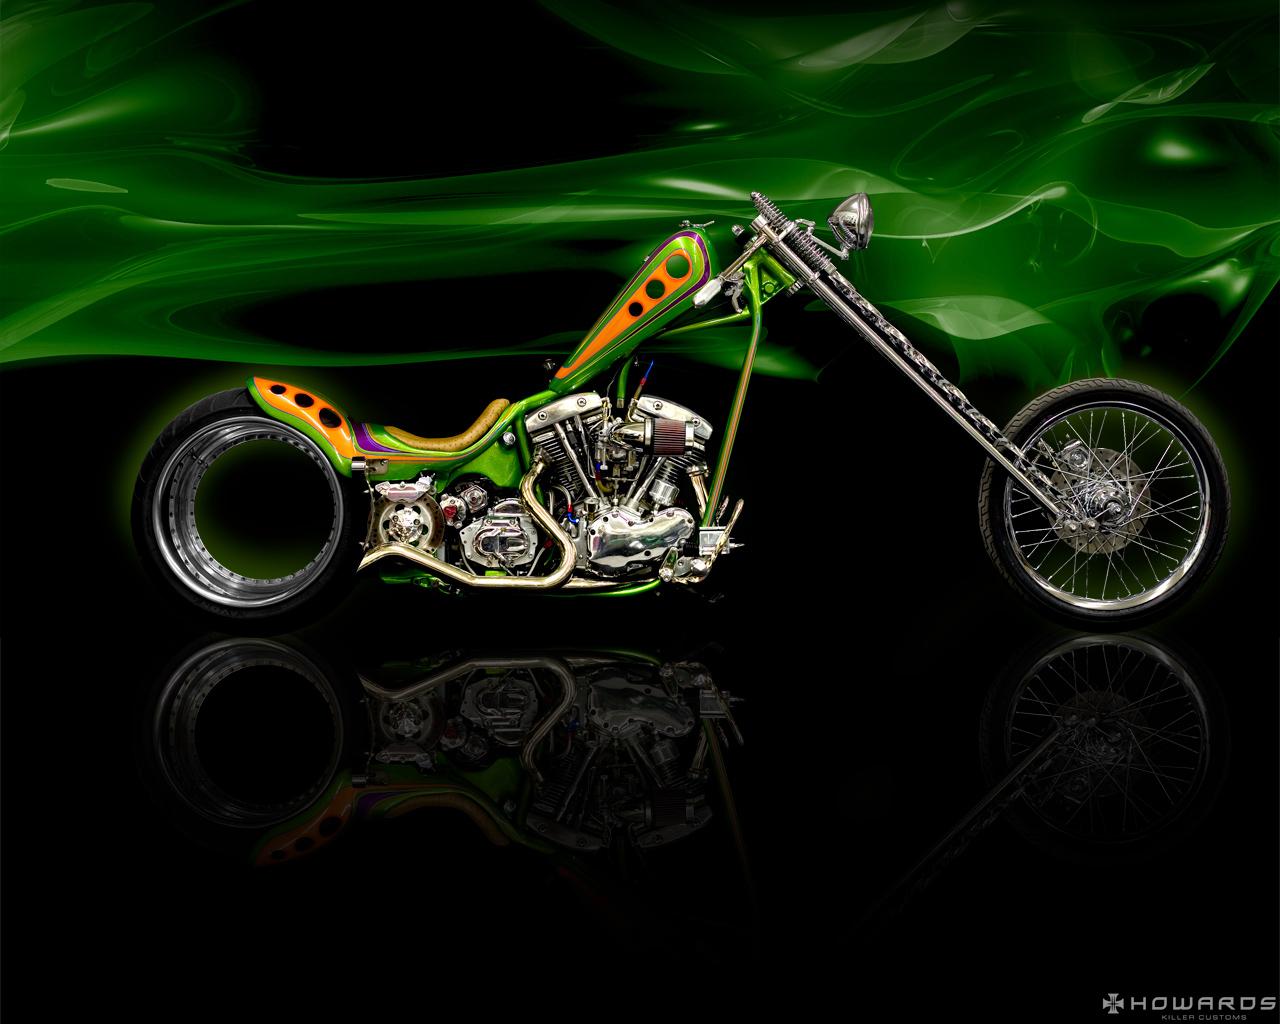 motorcycle wallpaper hd harley davidson hd wallpaper harley davidson 1280x1024